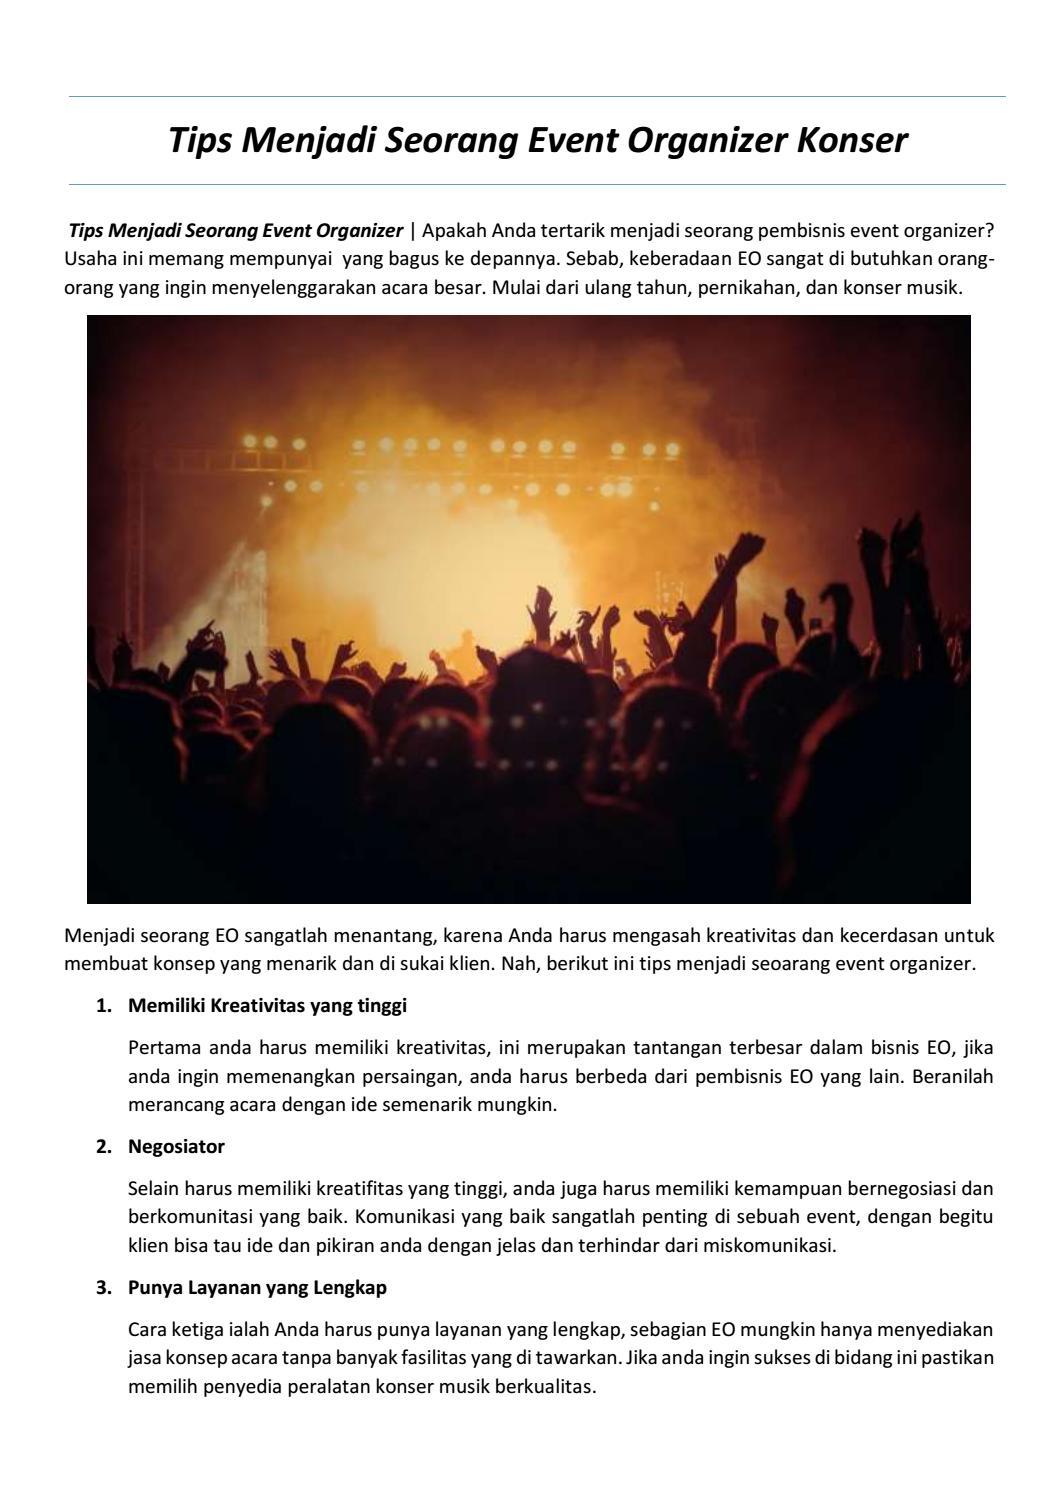 Tips Menjadi Seorang Event Organizer Konser By Webarthurteknik Issuu